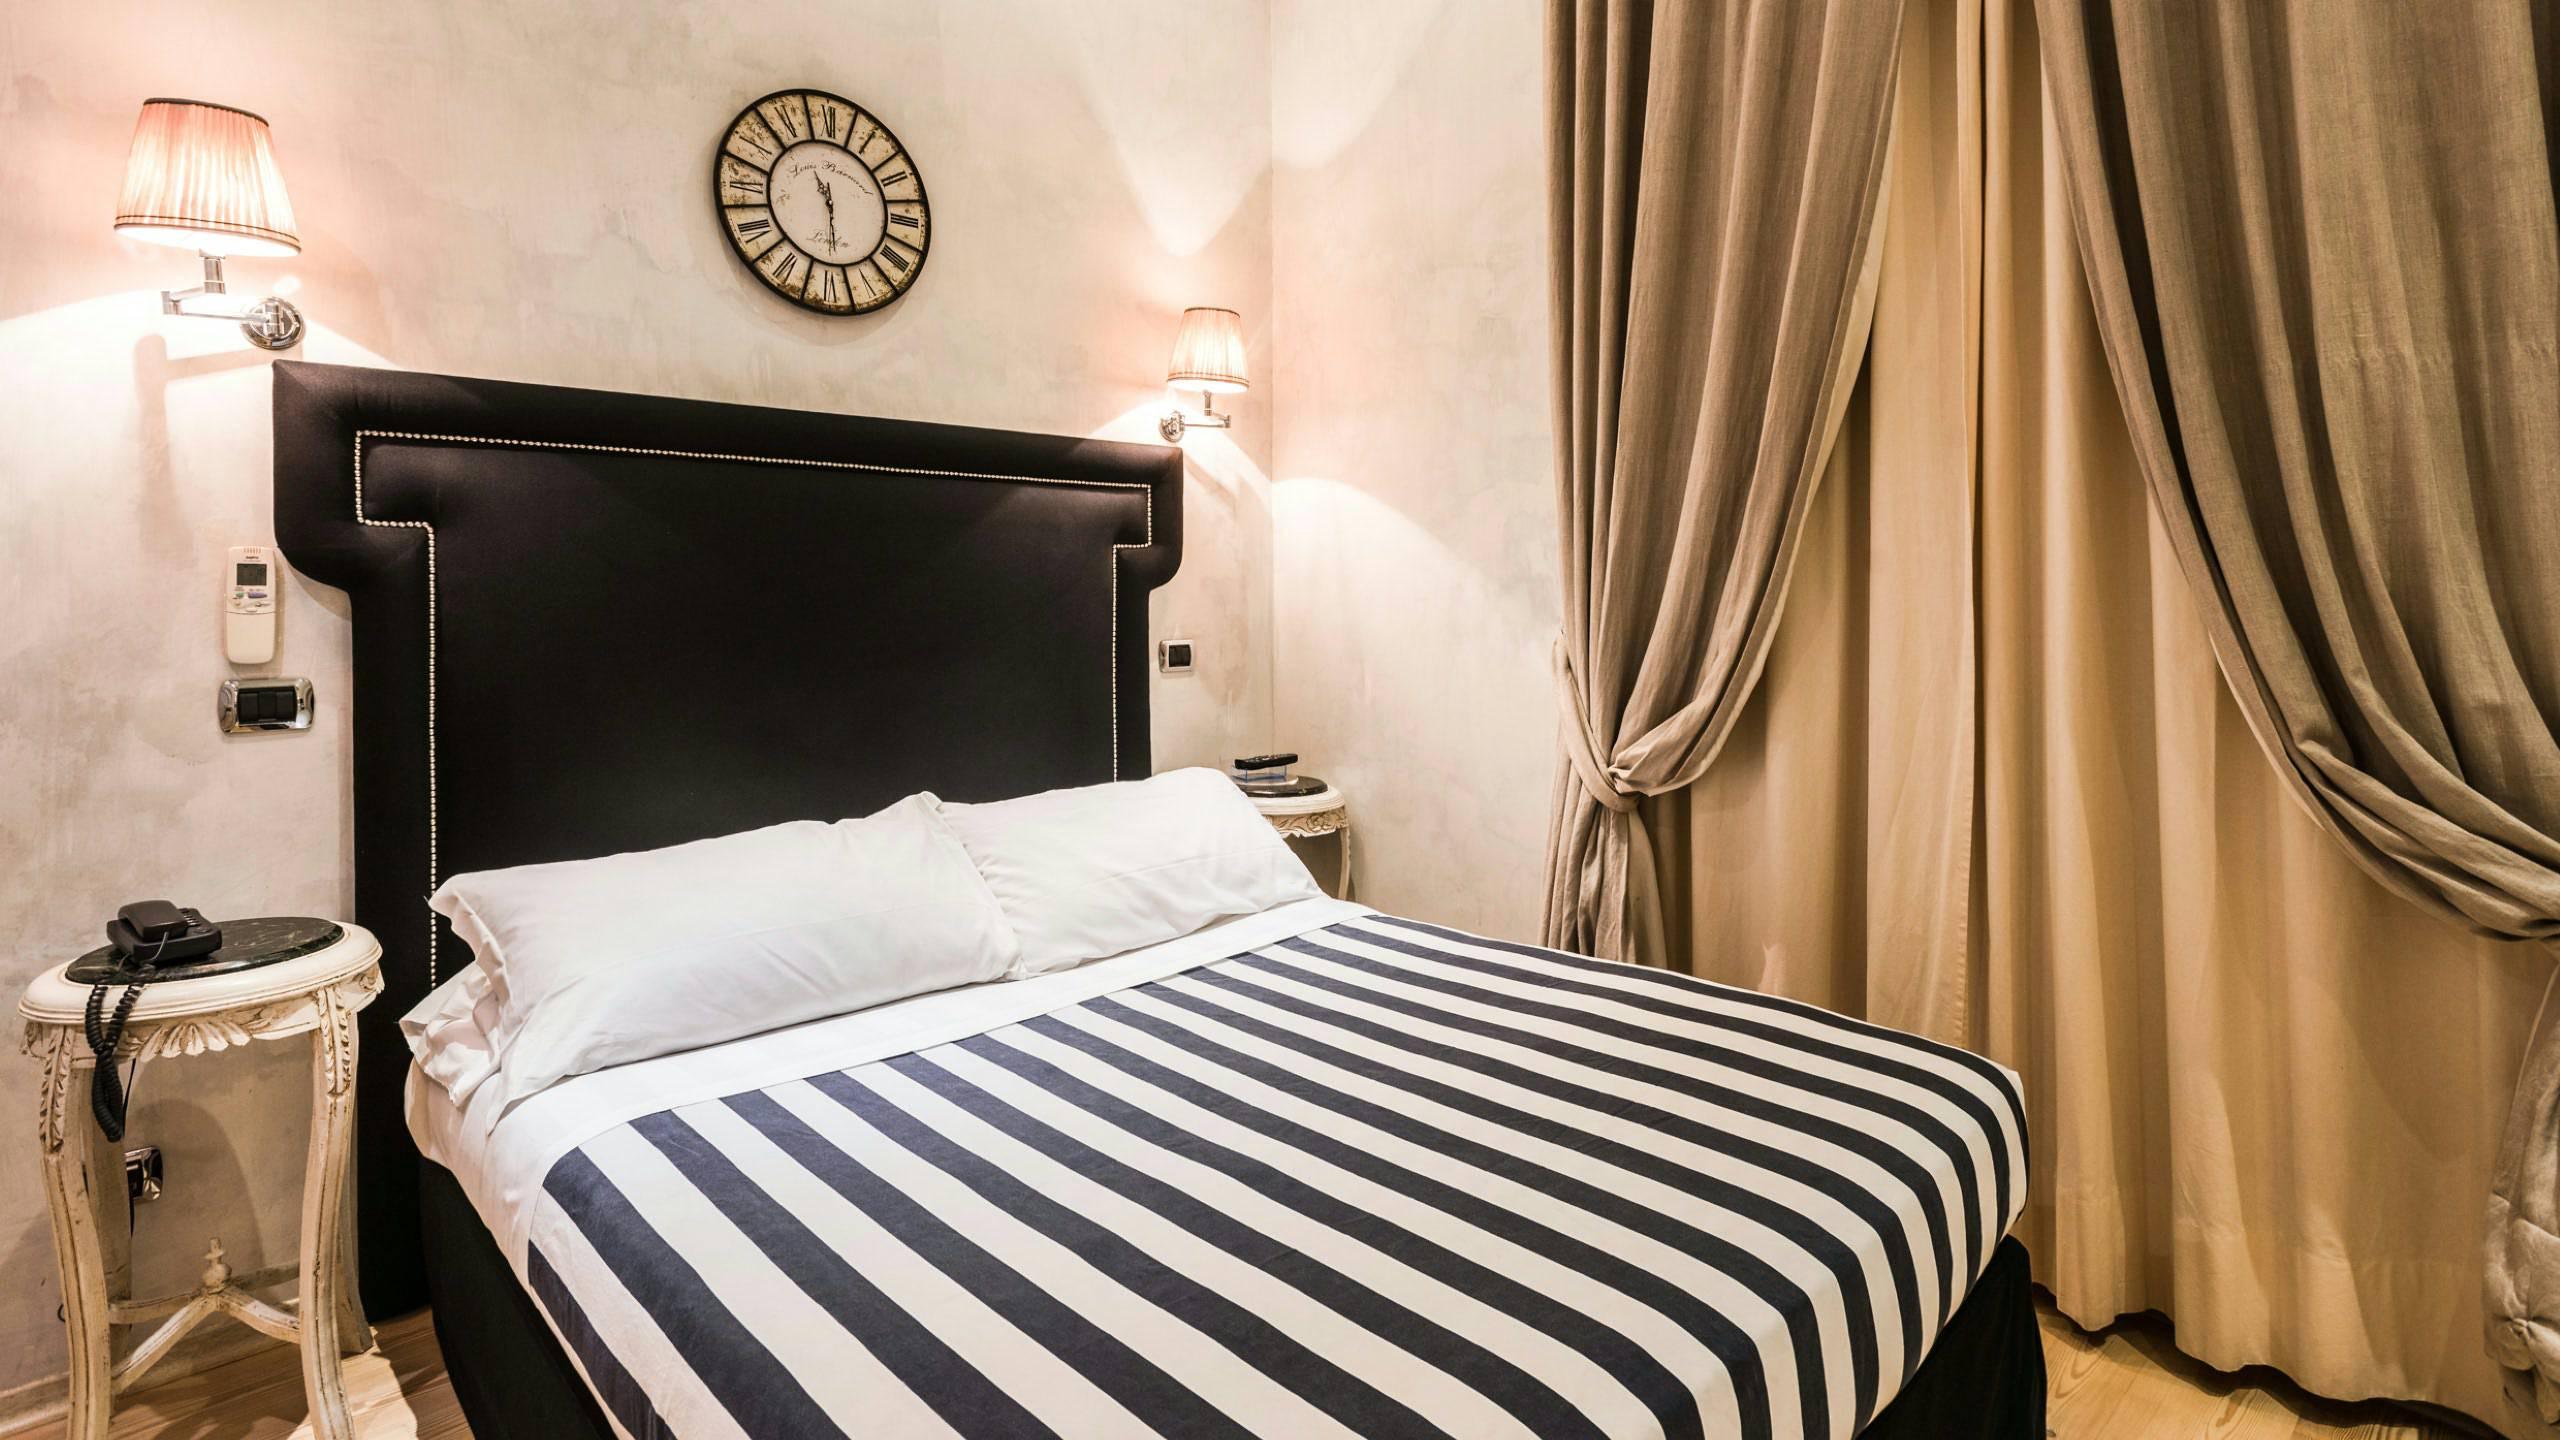 Mdm luxury rooms roma camera luxury for Interno 7 luxury rooms